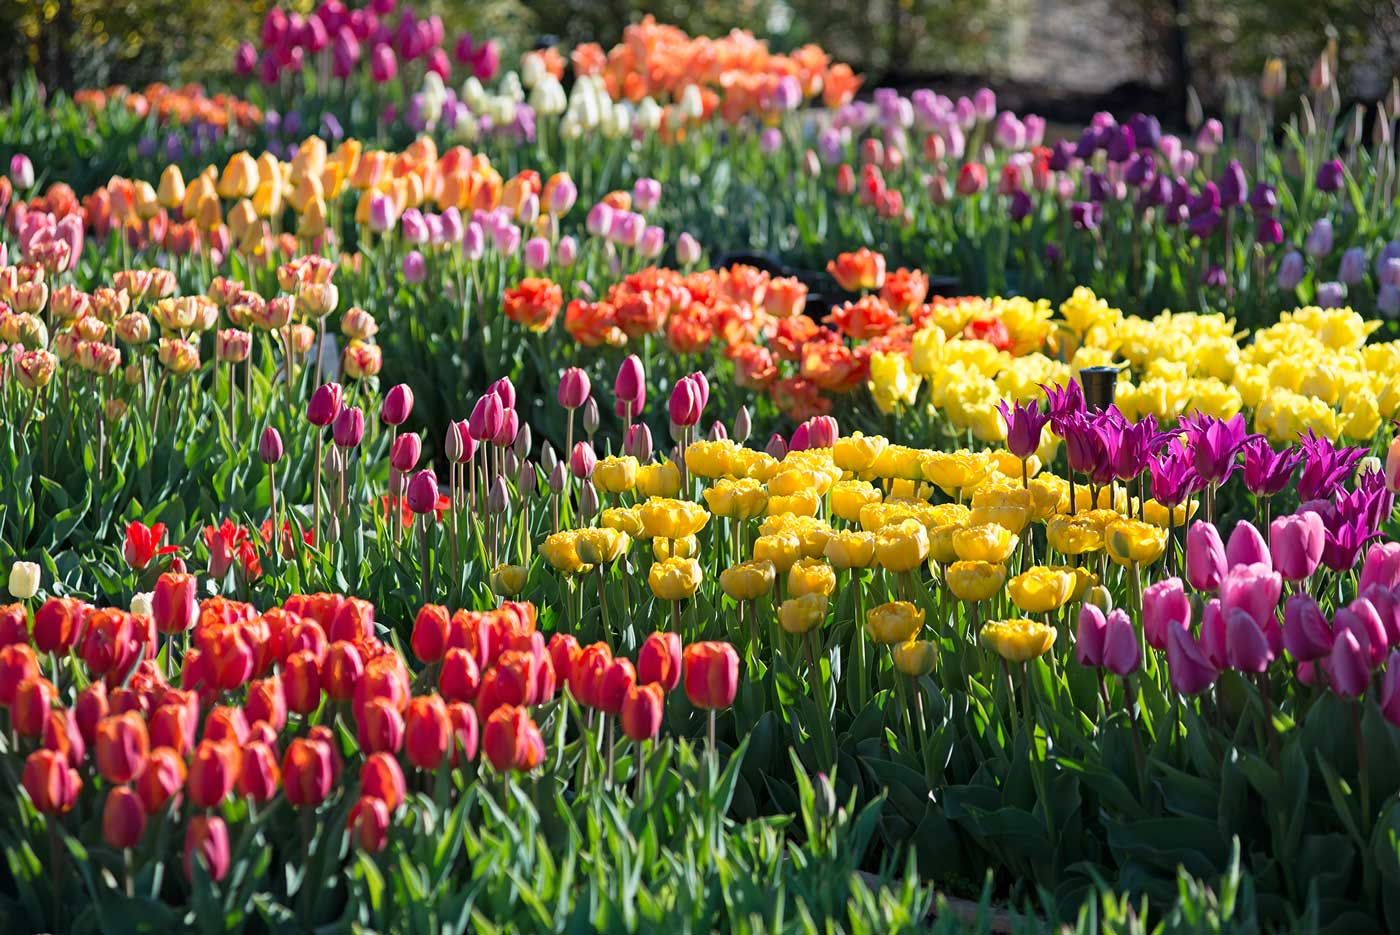 Spring Bulb Garden Tulips - Longfield Gardens